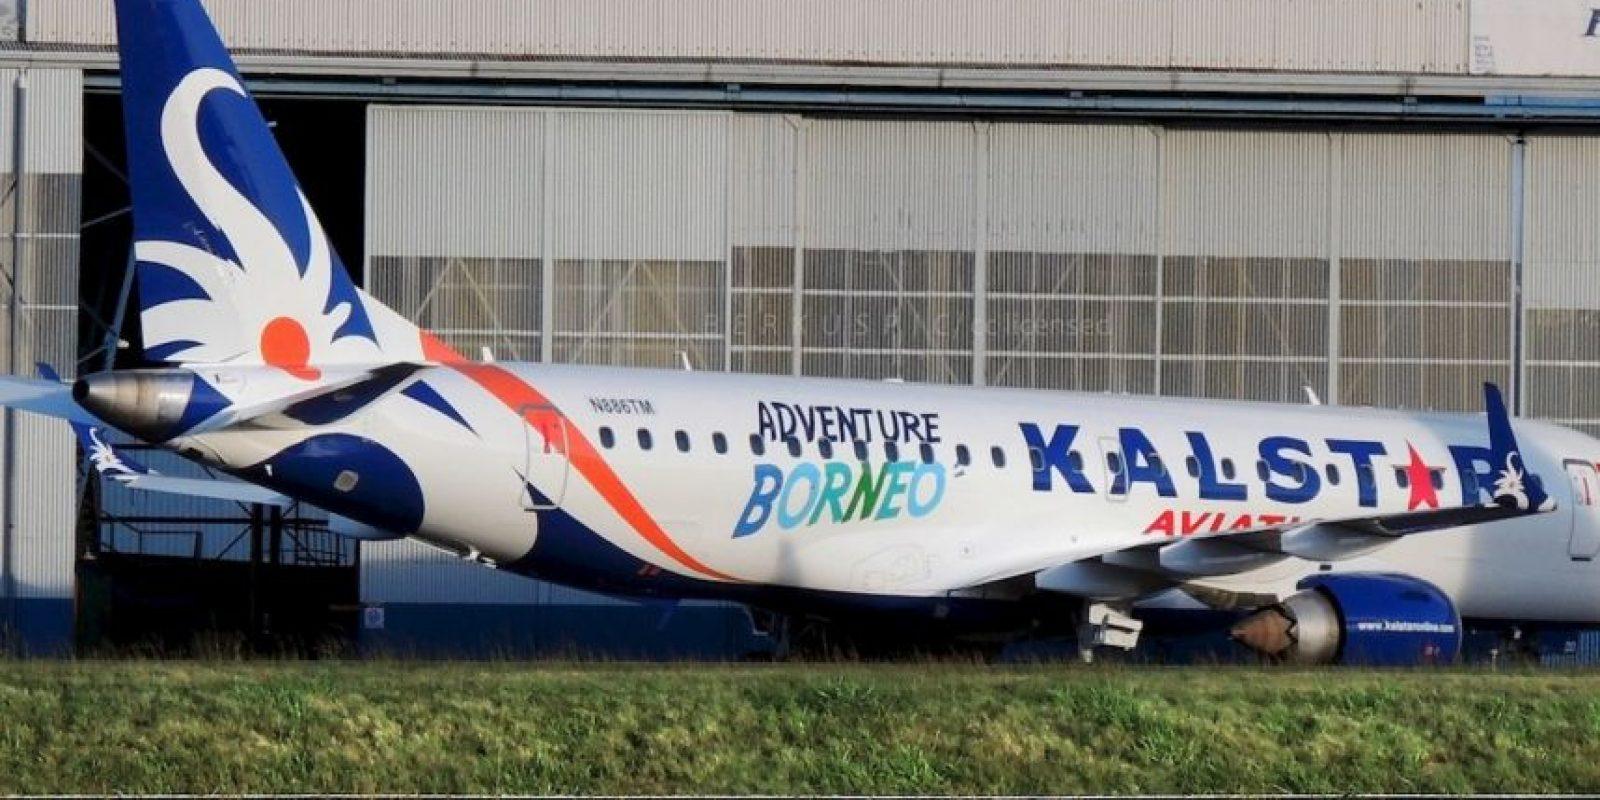 KalStar Aviation Foto:Wikipedia Commons